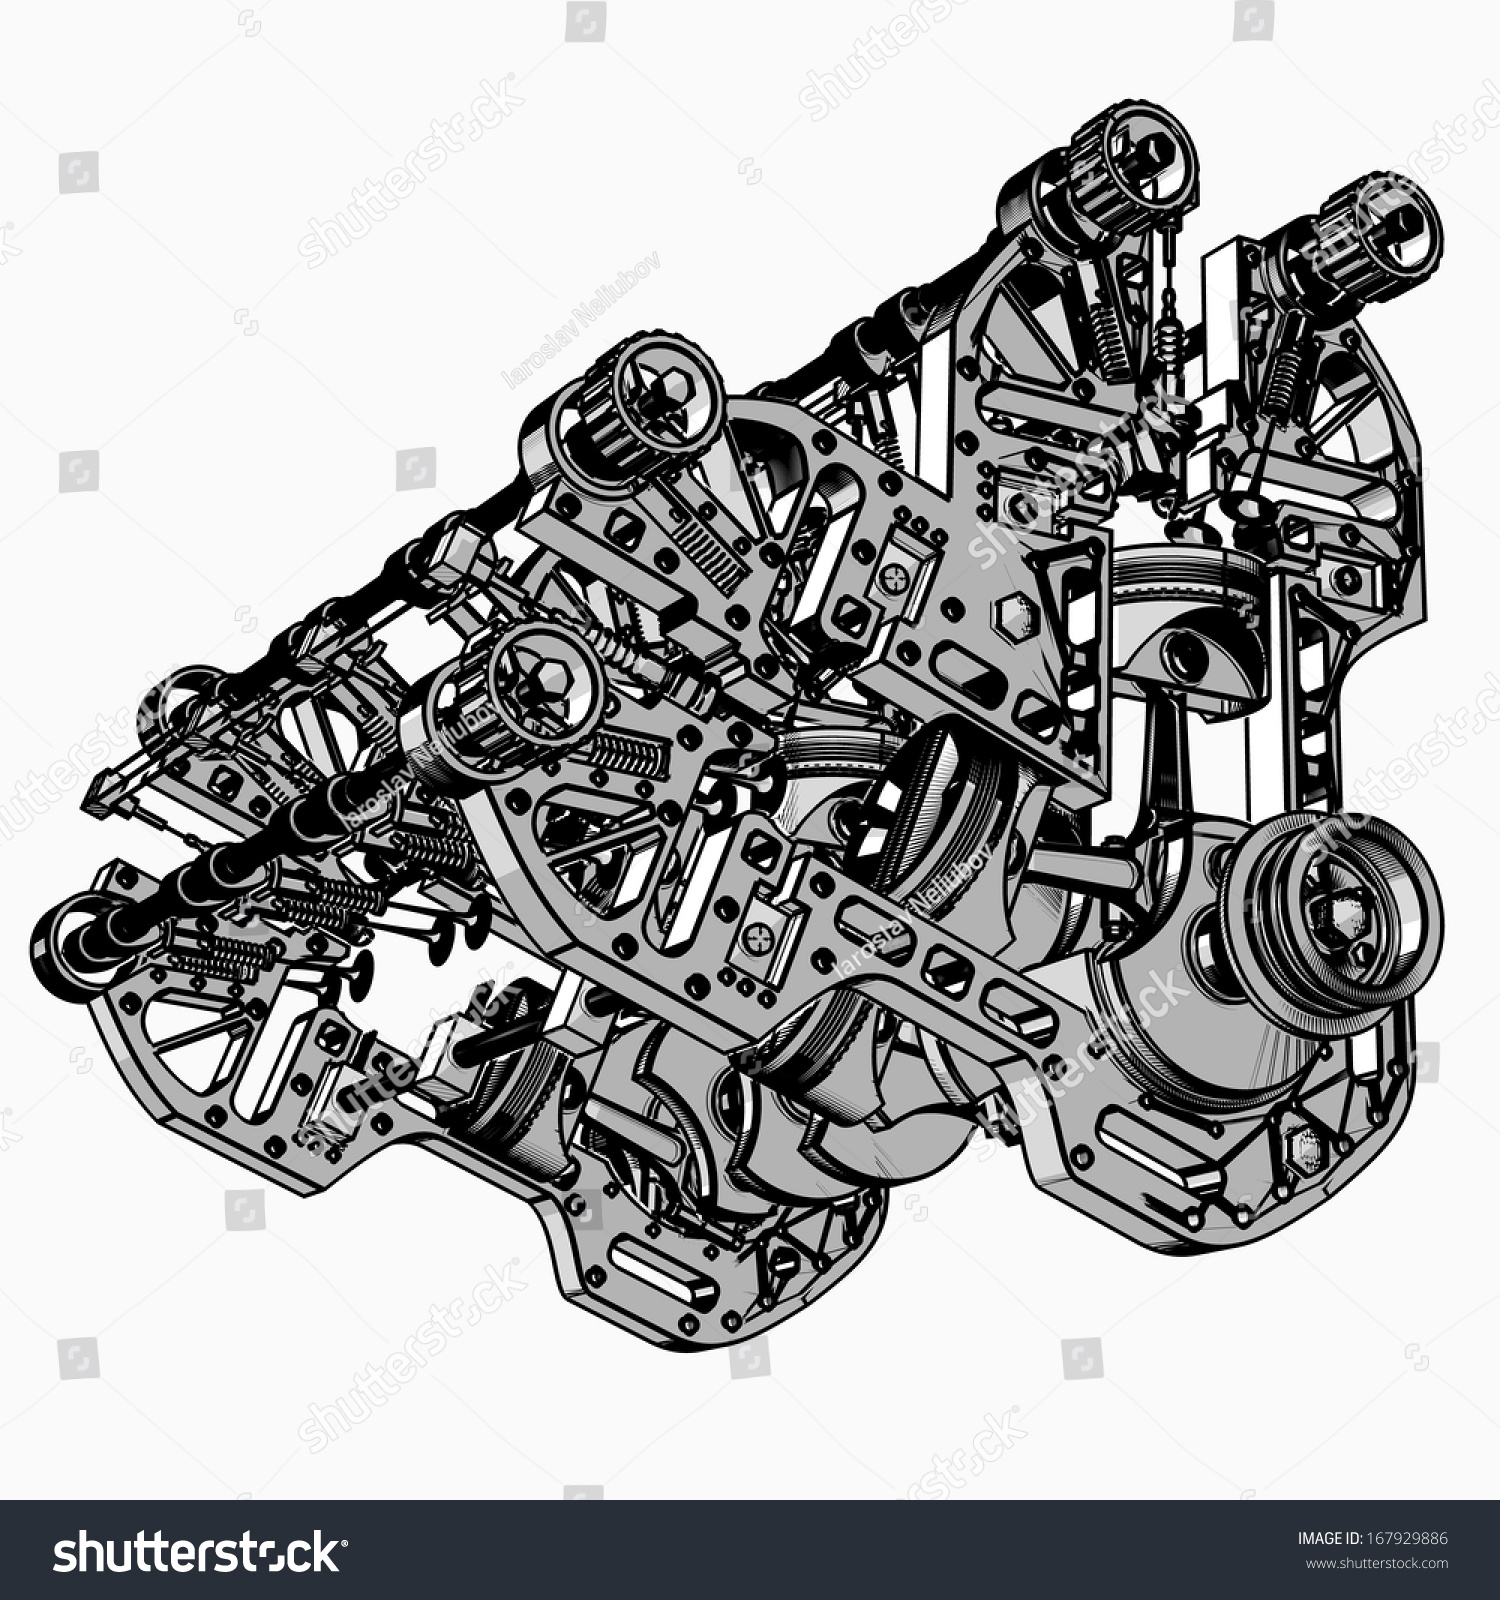 V 8 Car Engine Black White Drawing Stock Illustration 167929886 ...